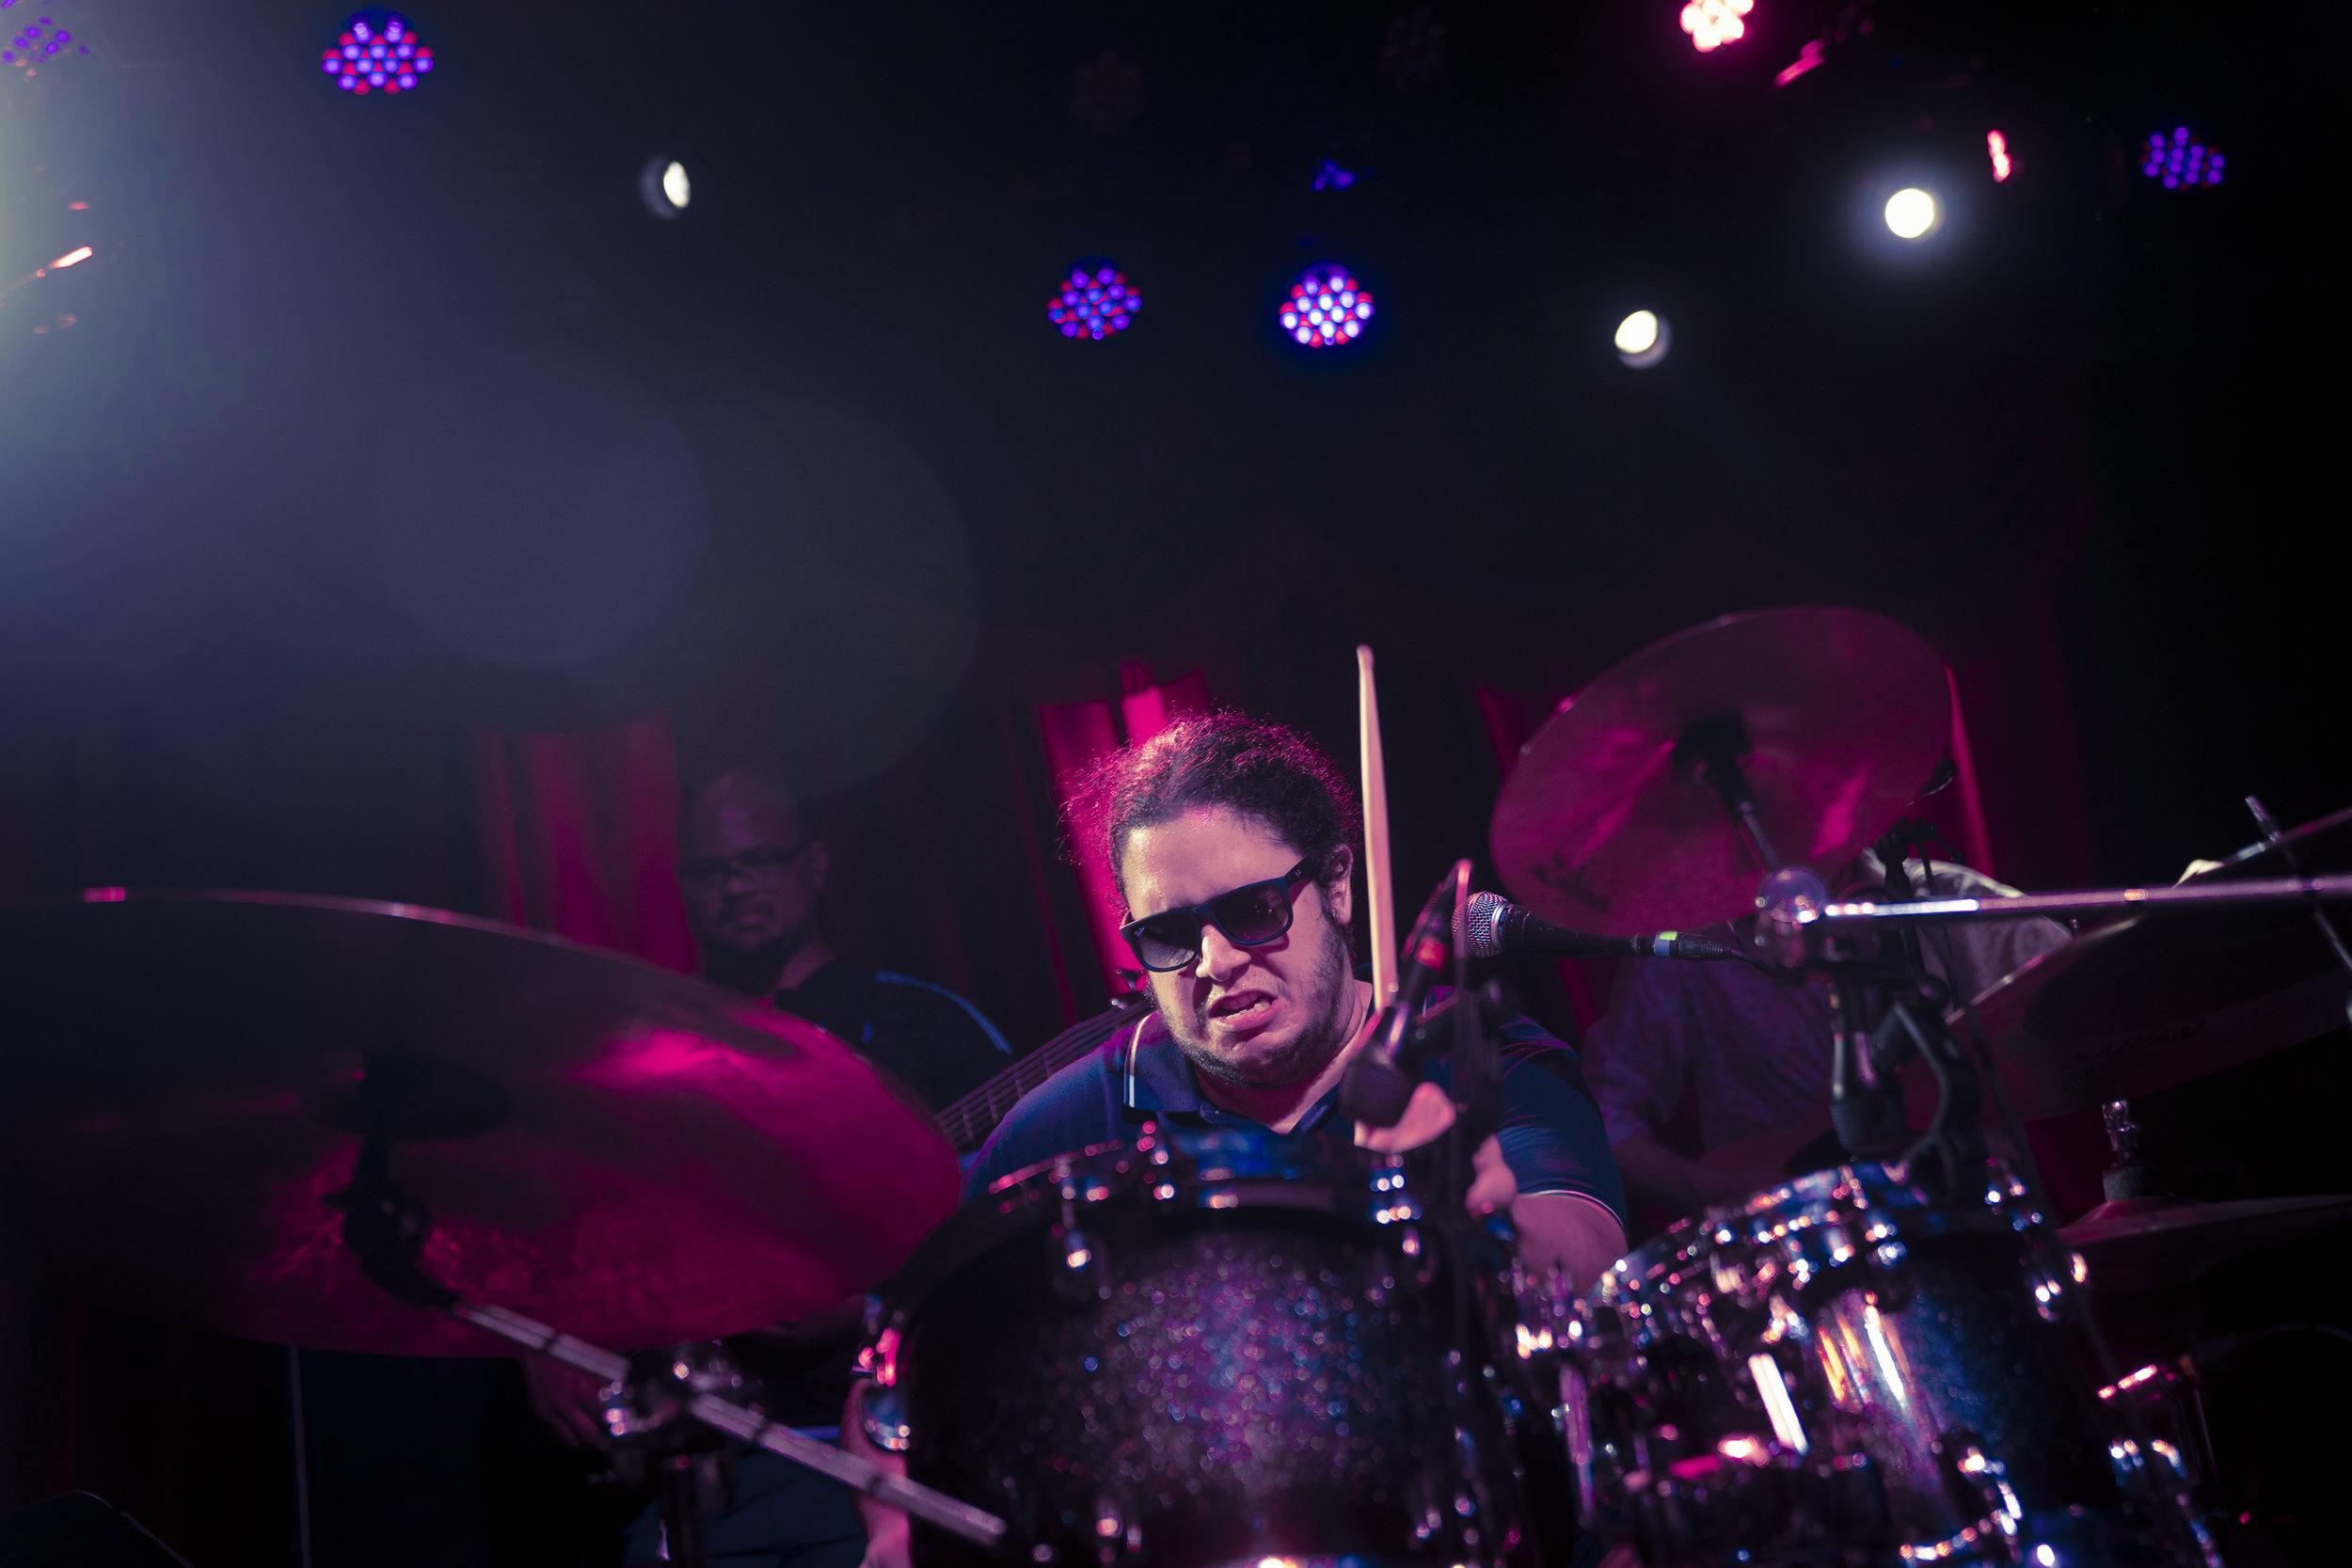 Angel Acevedo - bandleader 2015 to present